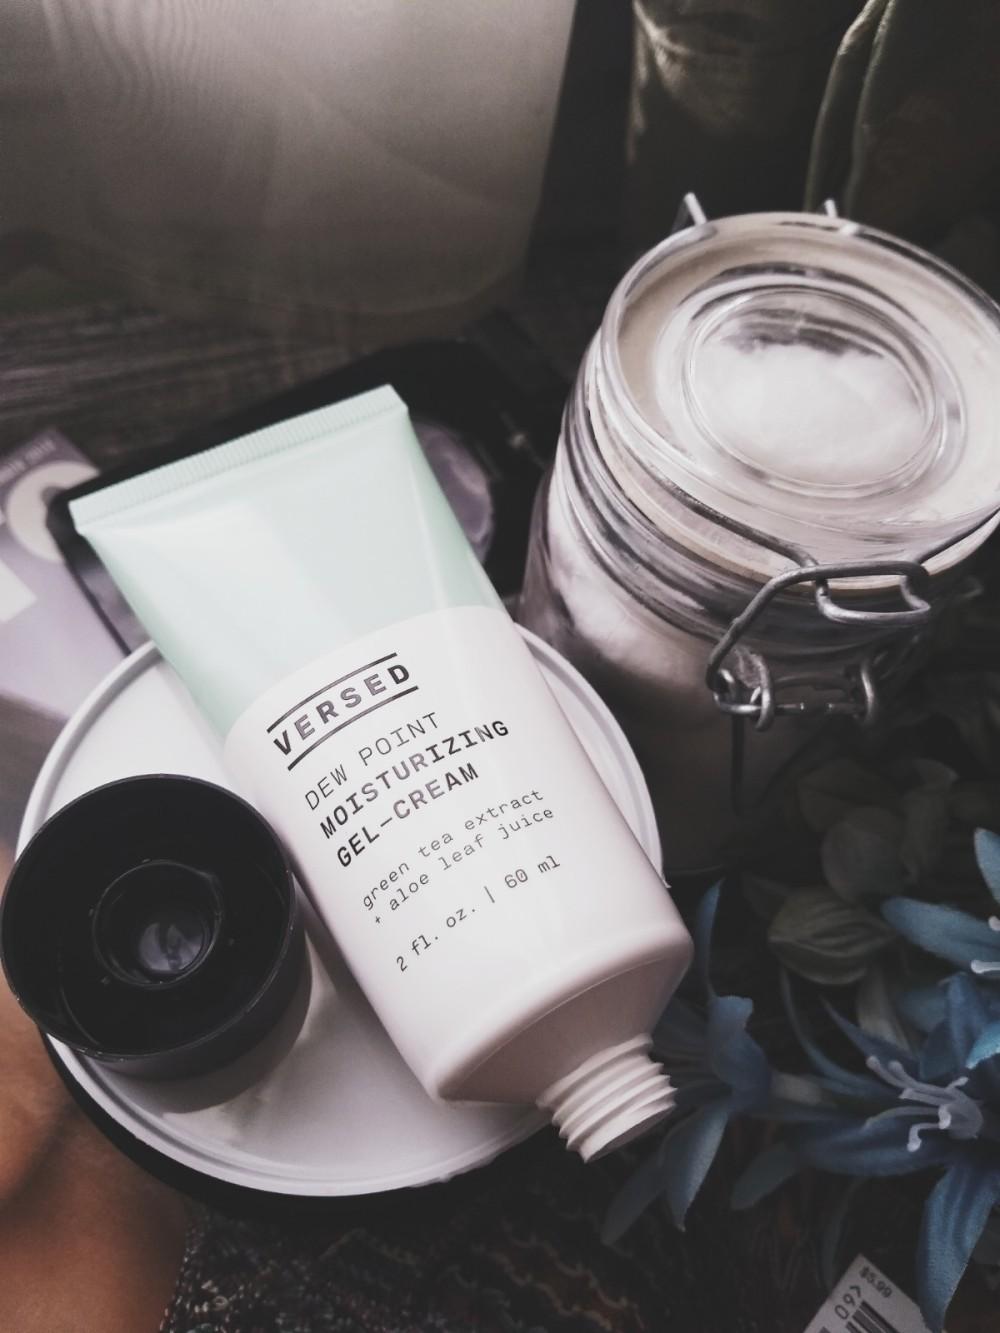 Versed Skincare Dew Point Moisturizing Gel-Cream Review- JustNatonya